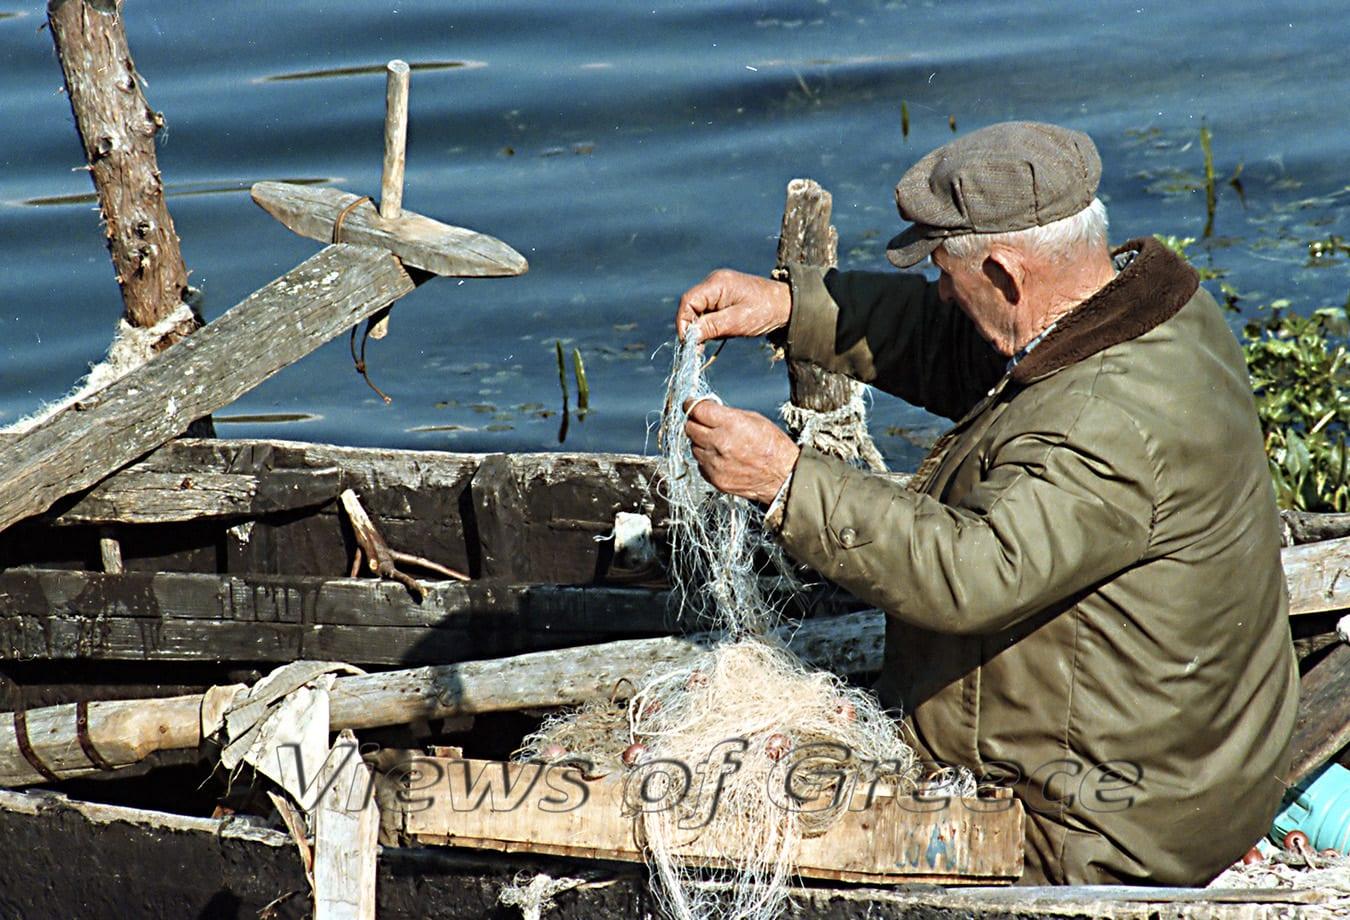 prespes, greece, lake, florina, greek, macedonia, prespa, traditional boat, Πρέσπες, Πρέσπα, Ψαράδες, νομός Φλώρινας, Δυτική Μακεδονία,παραδοσιακές βάρκες, Εθνικό Πάρκο, παραδοσιακά επαγγέλματα,